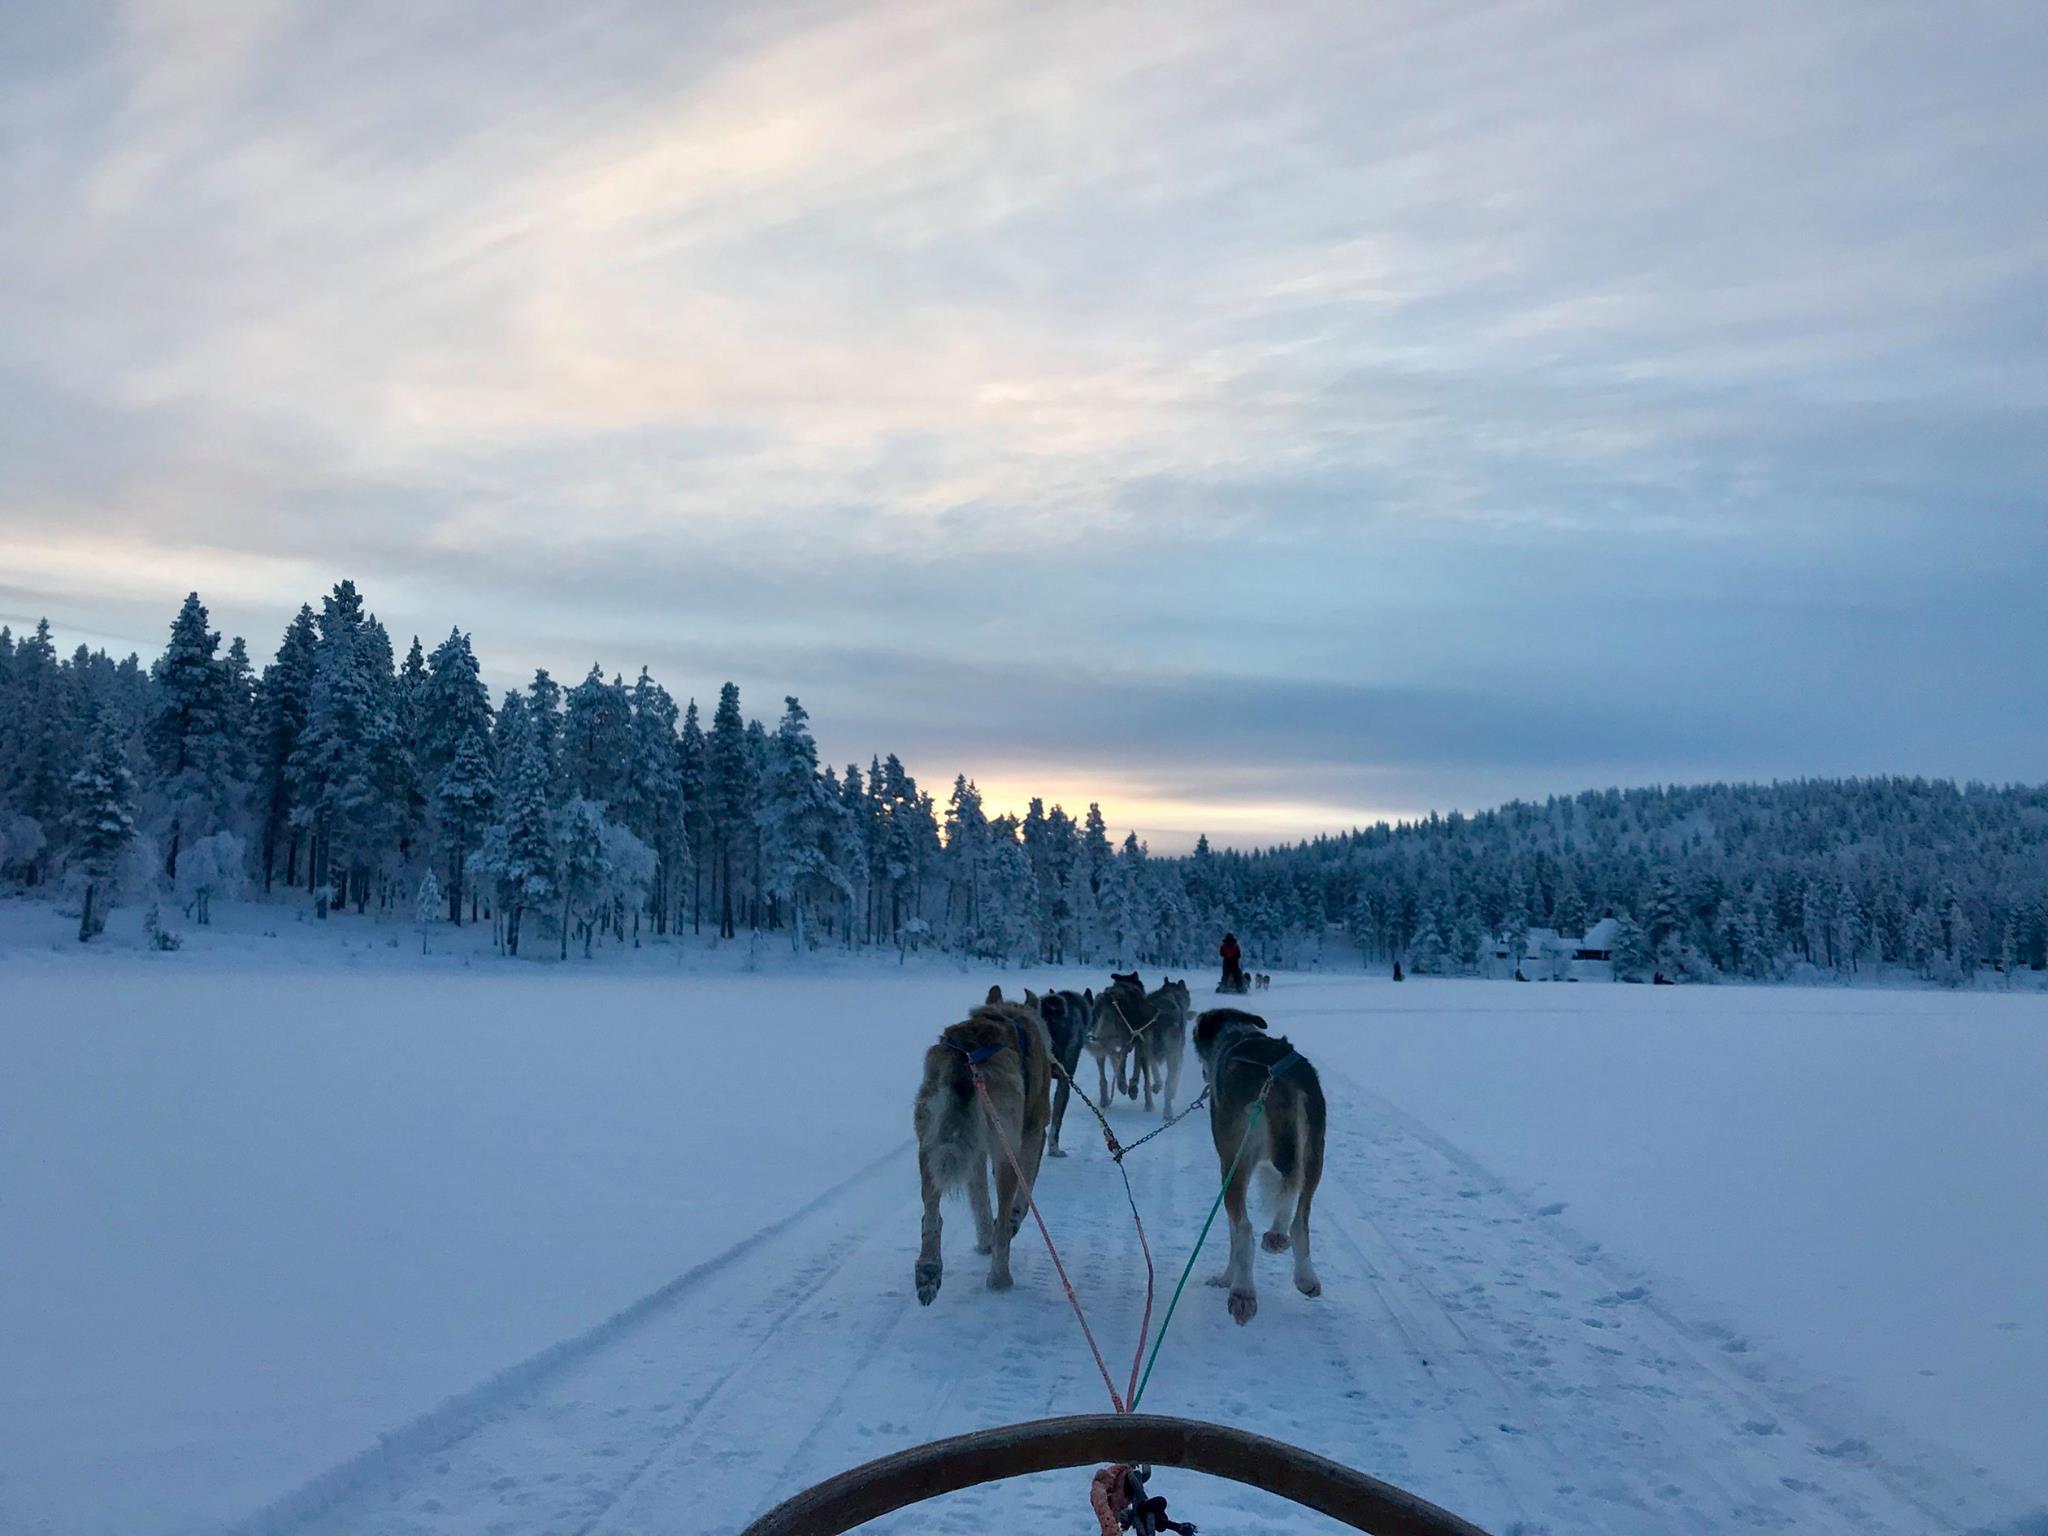 husky sledding with santa's lapland